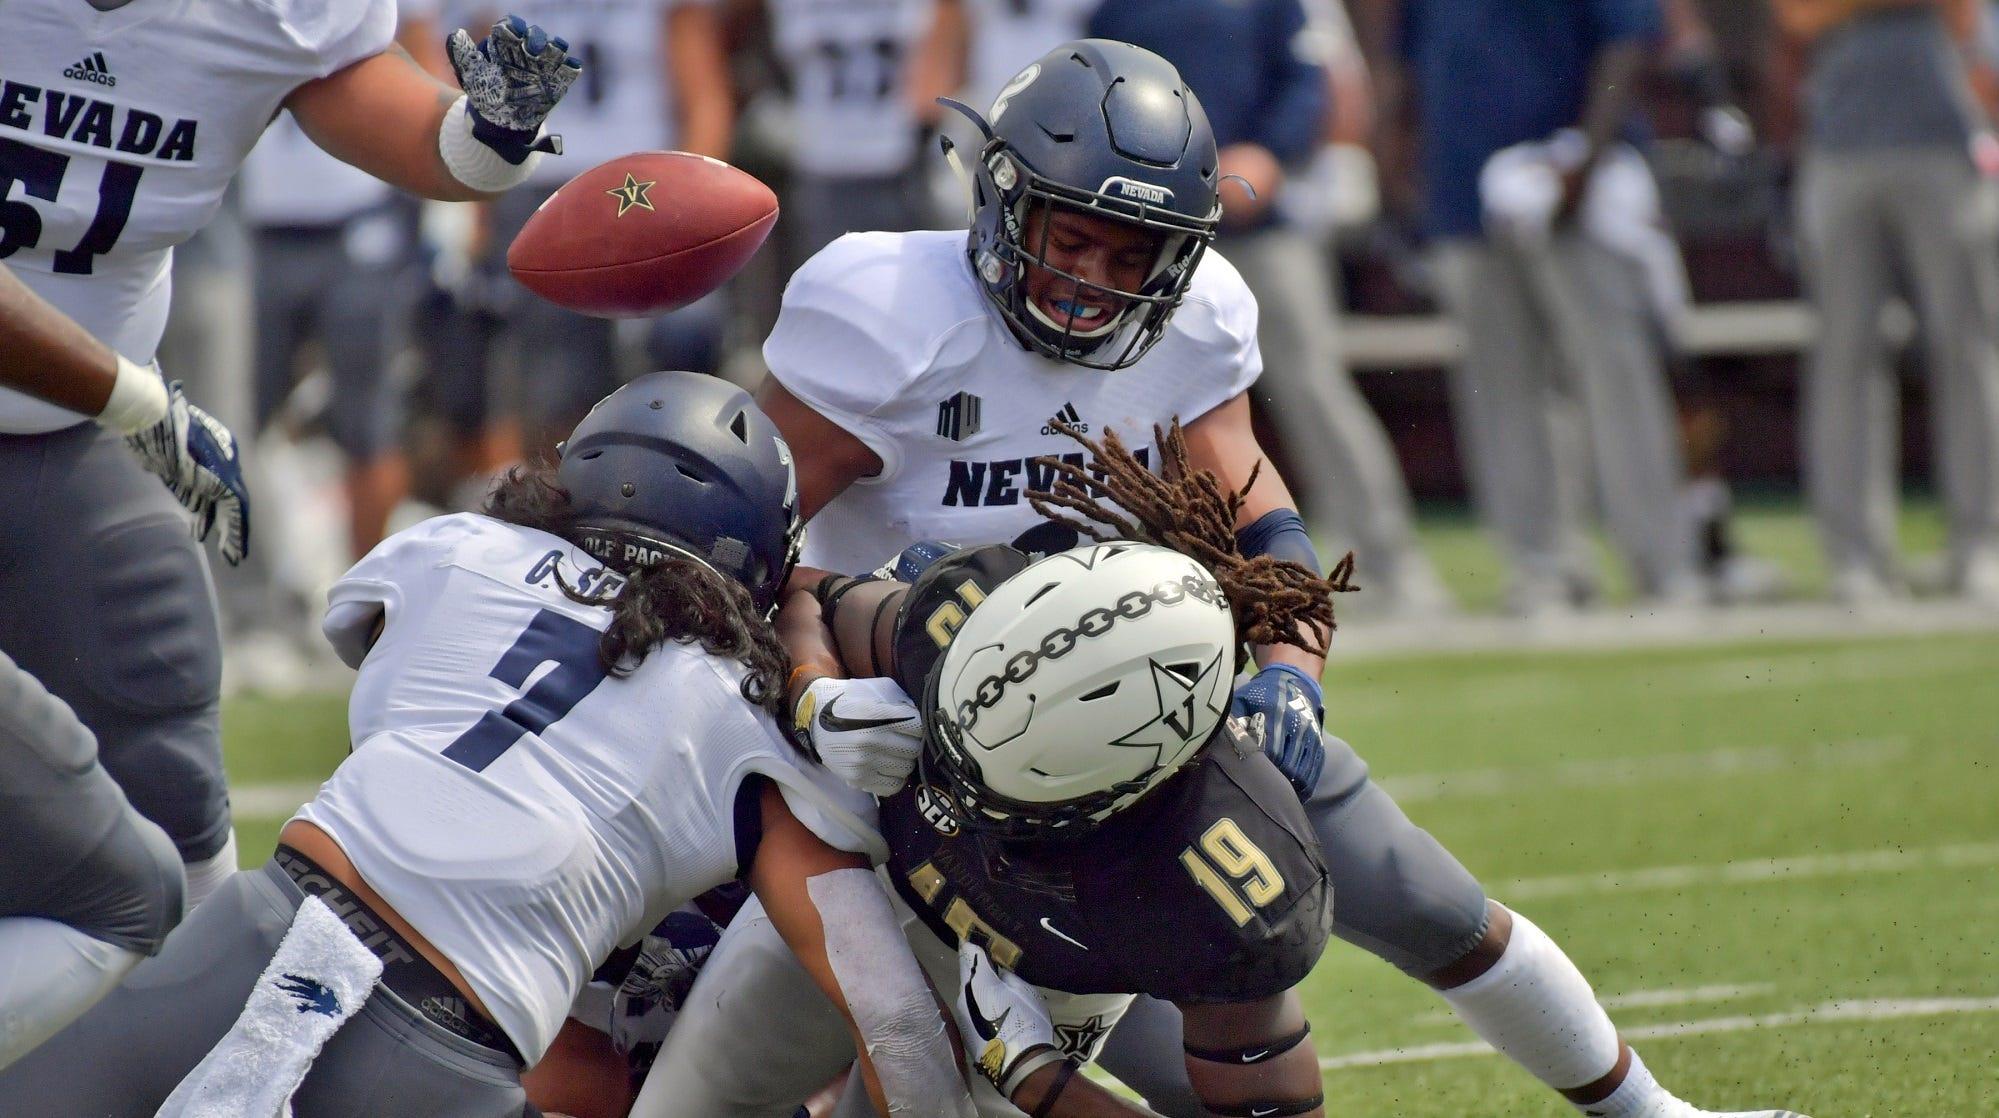 Vanderbilt wide receiver Chris Pierce (19) fumbles the ball against Nevada Wolf Pack linebacker Gabriel Sewell (7) during the first half at Vanderbilt Stadium.